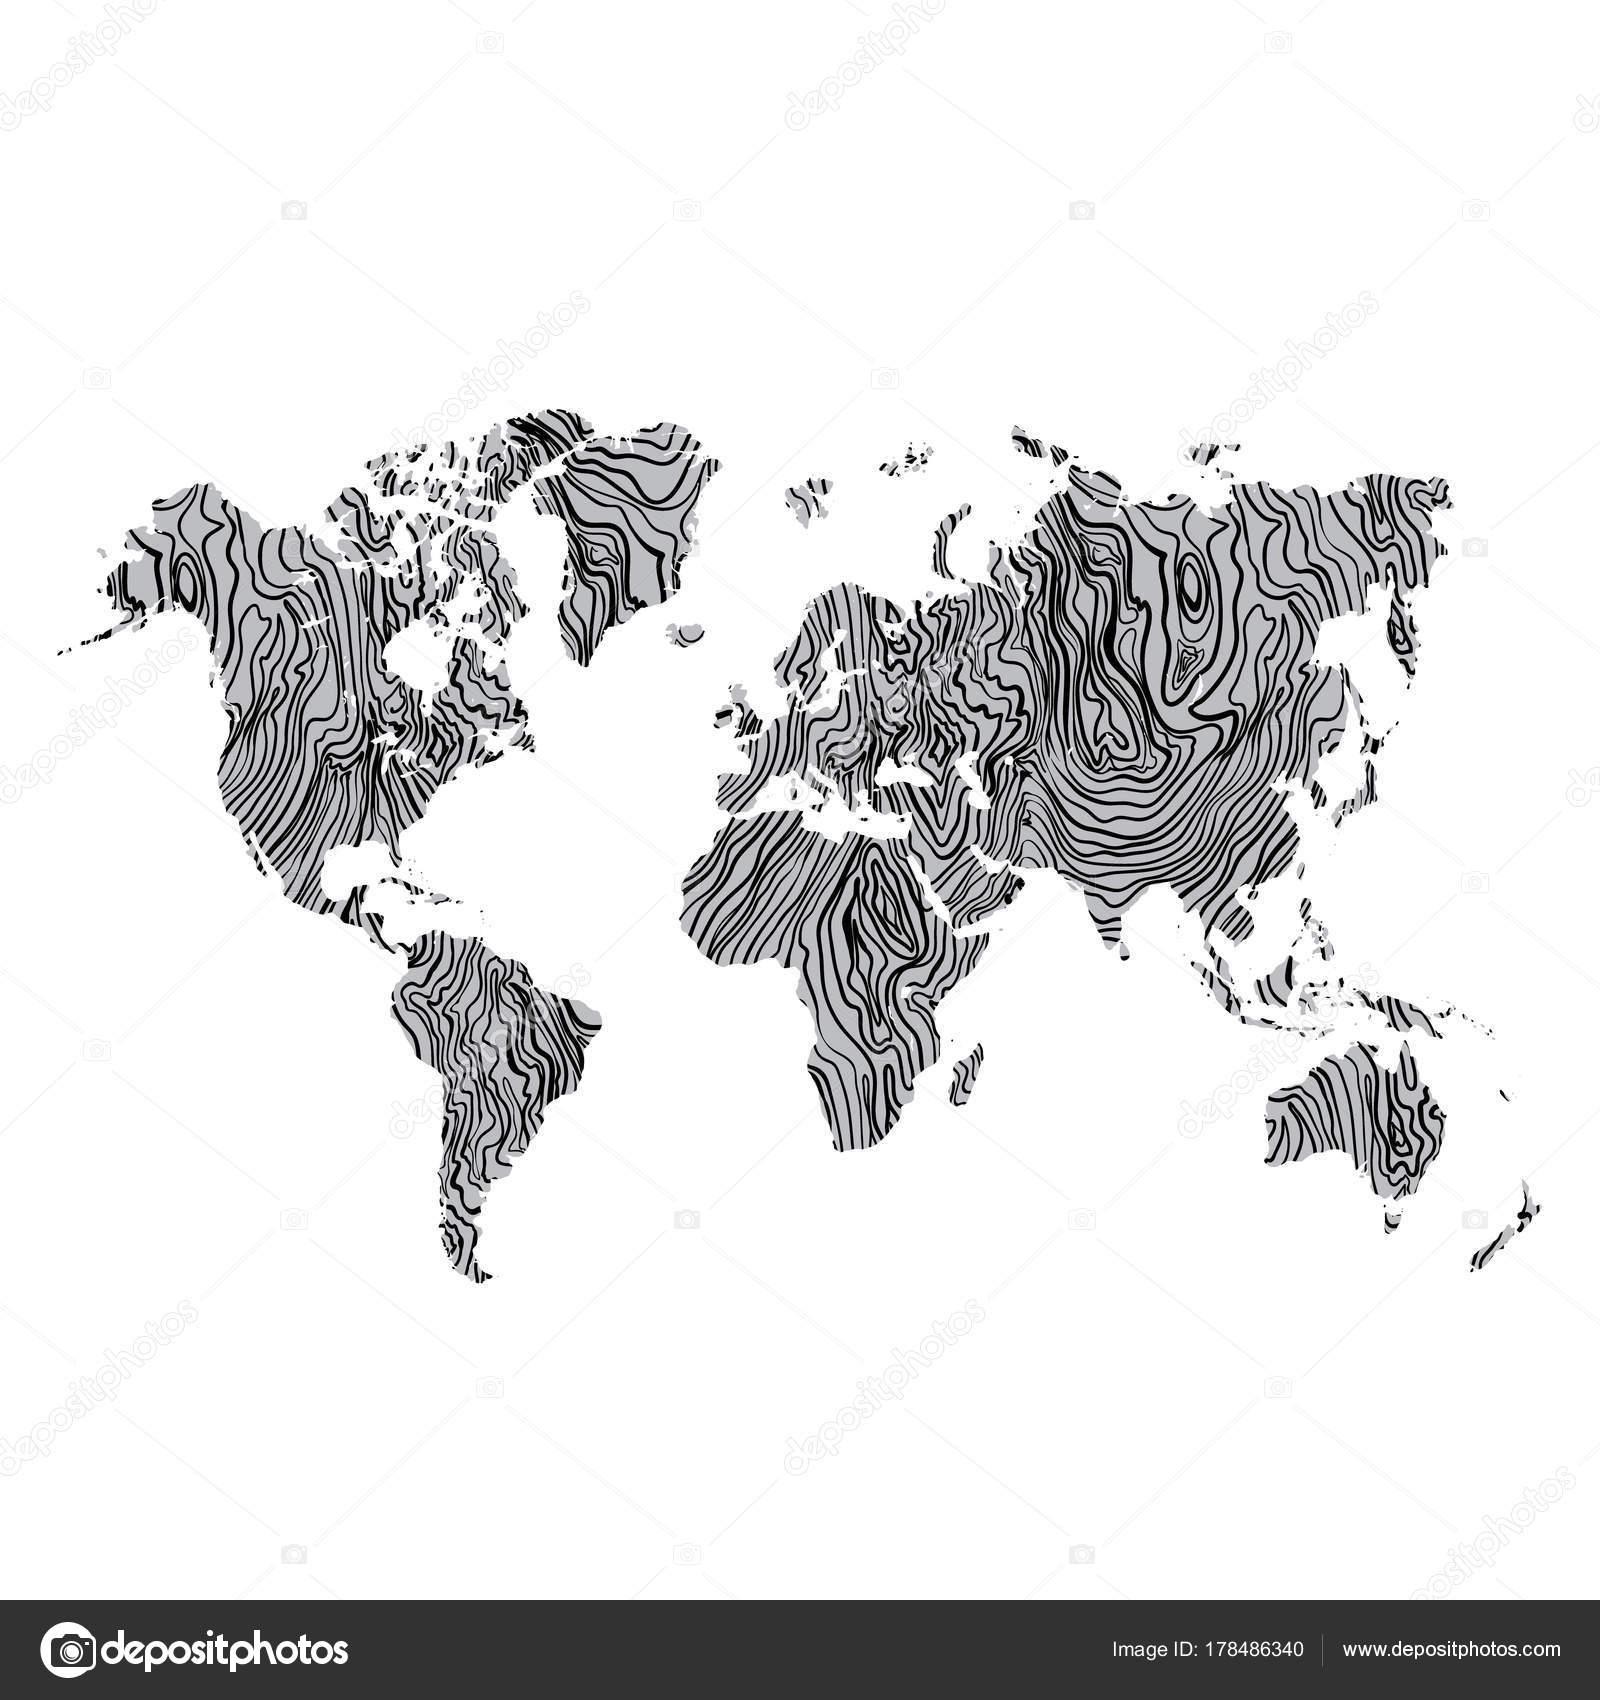 Textura de madera mapamundi gris mano negro dibujado sobre fondo textura de madera mapamundi gris mano negro dibujado sobre fondo vector de archivo imgenes gumiabroncs Choice Image